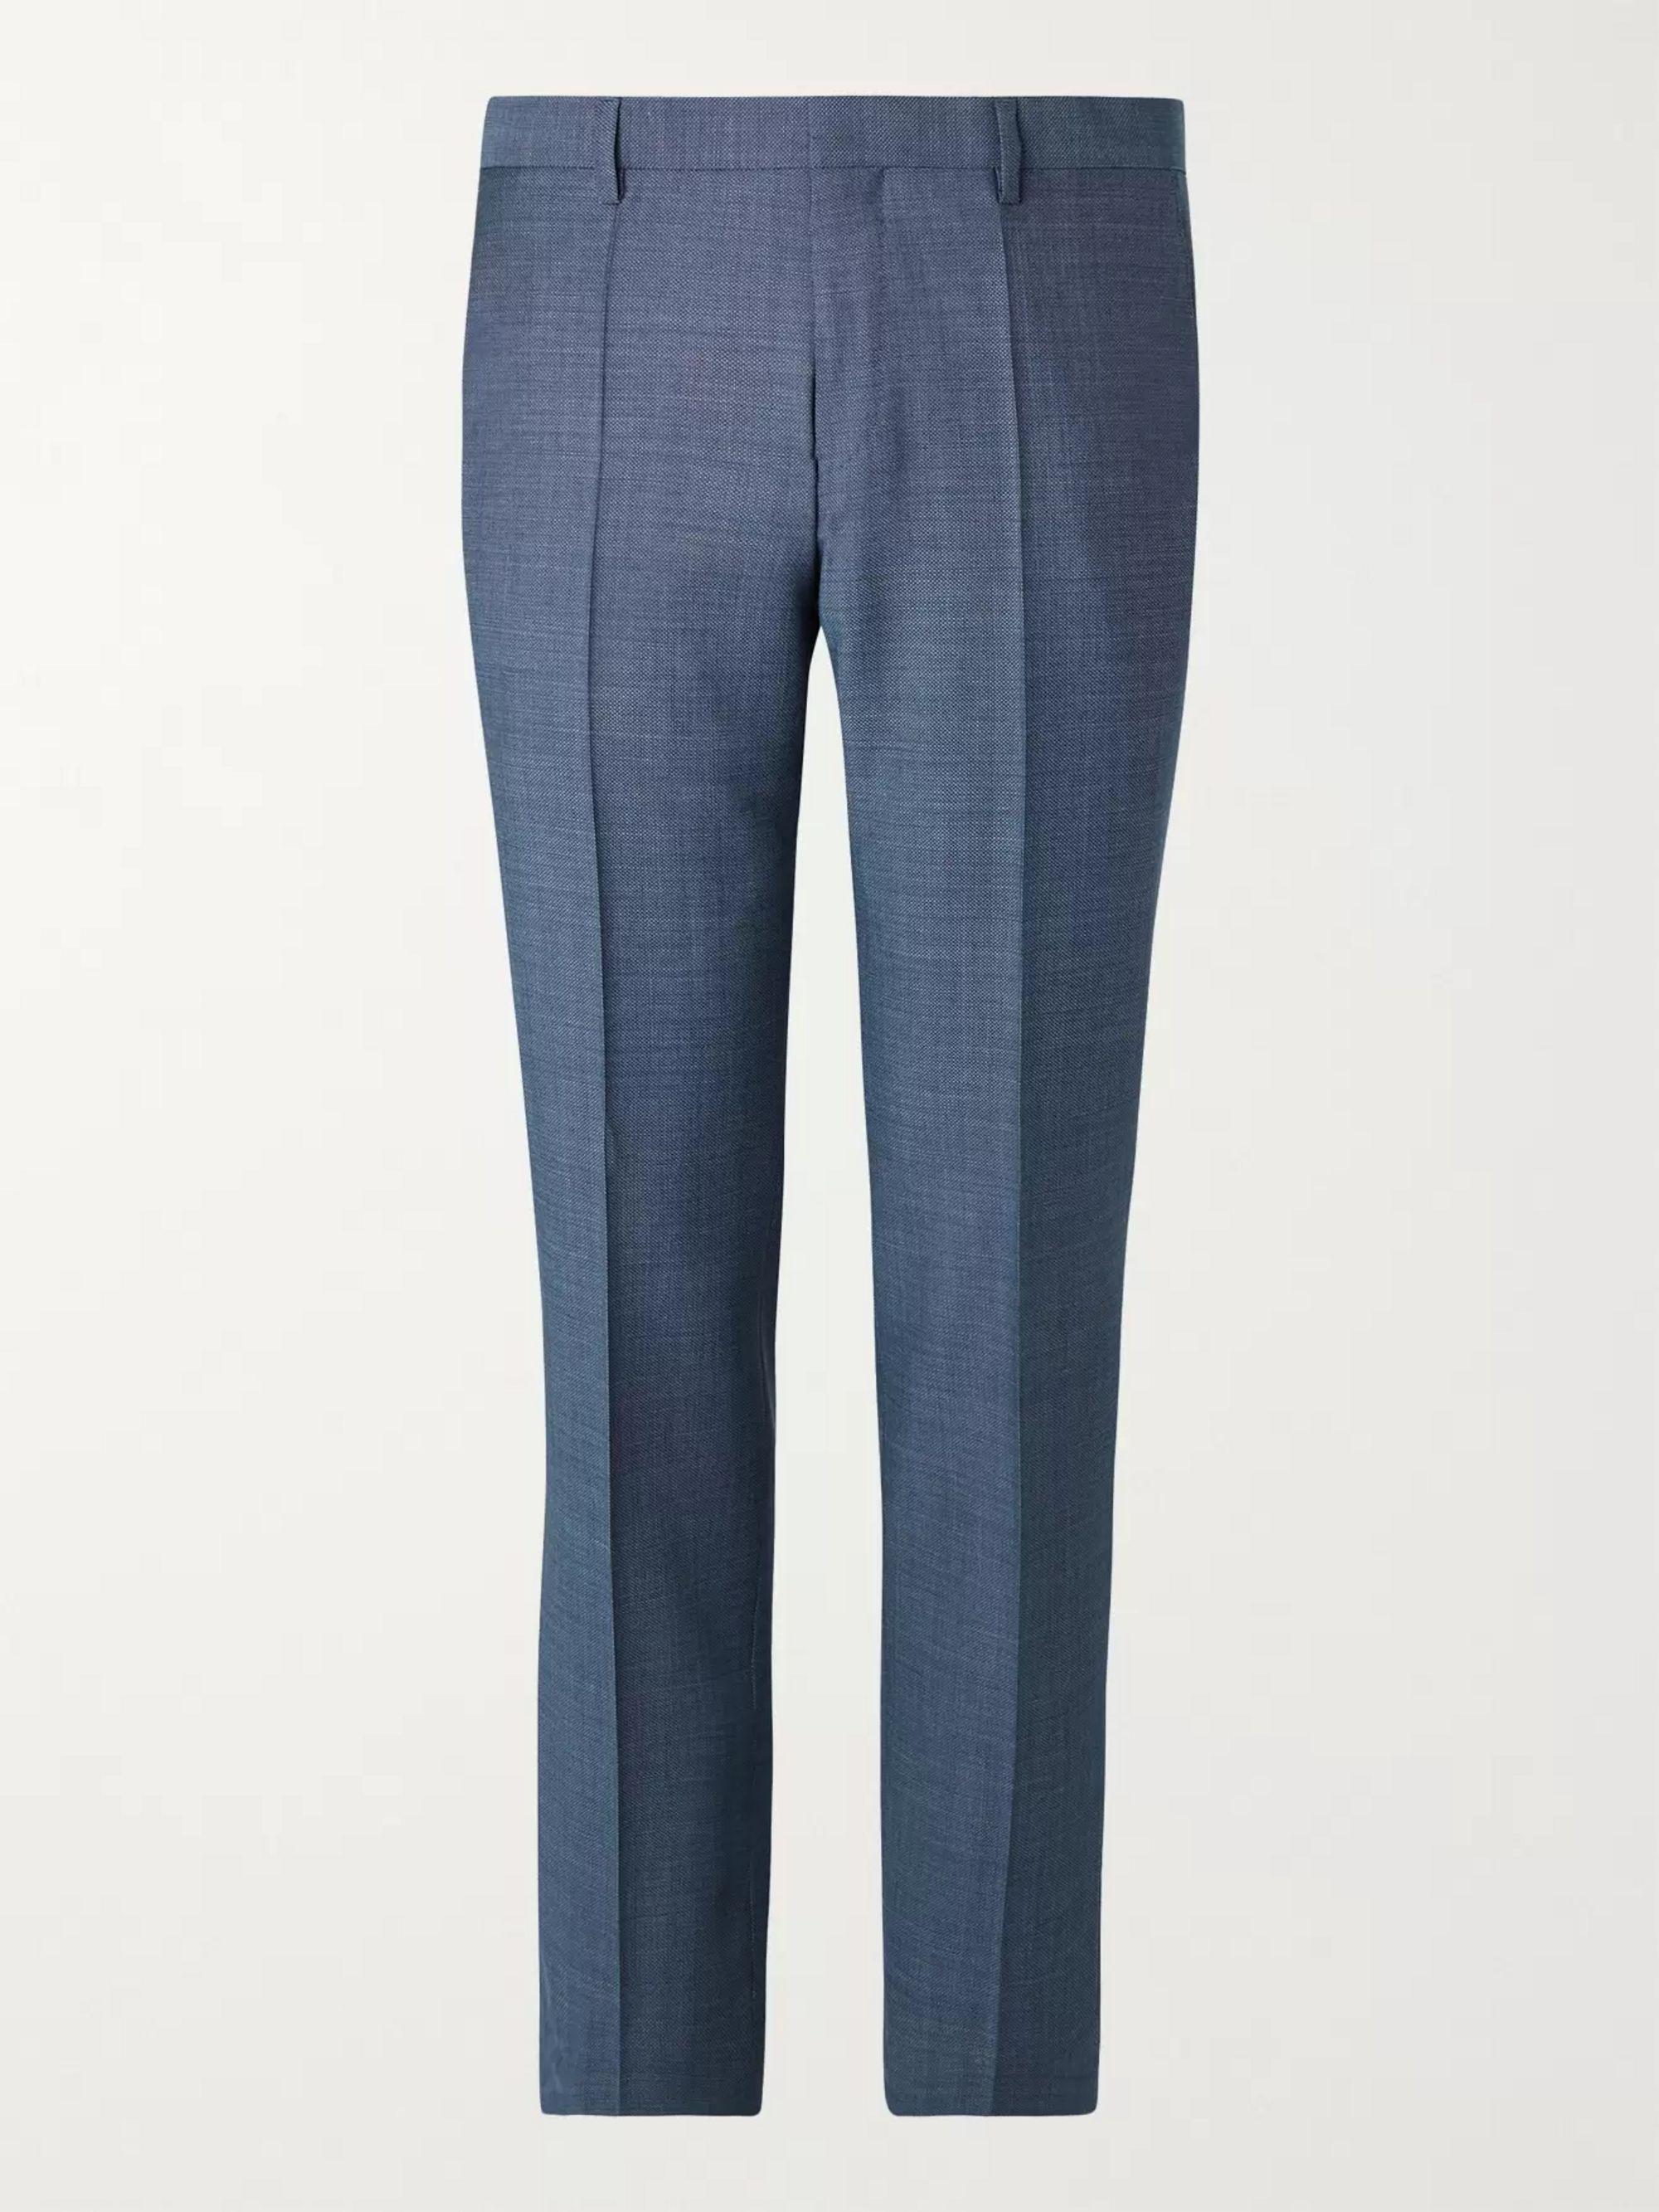 HUGO BOSS Genius Birdseye Virgin Wool Suit Trousers